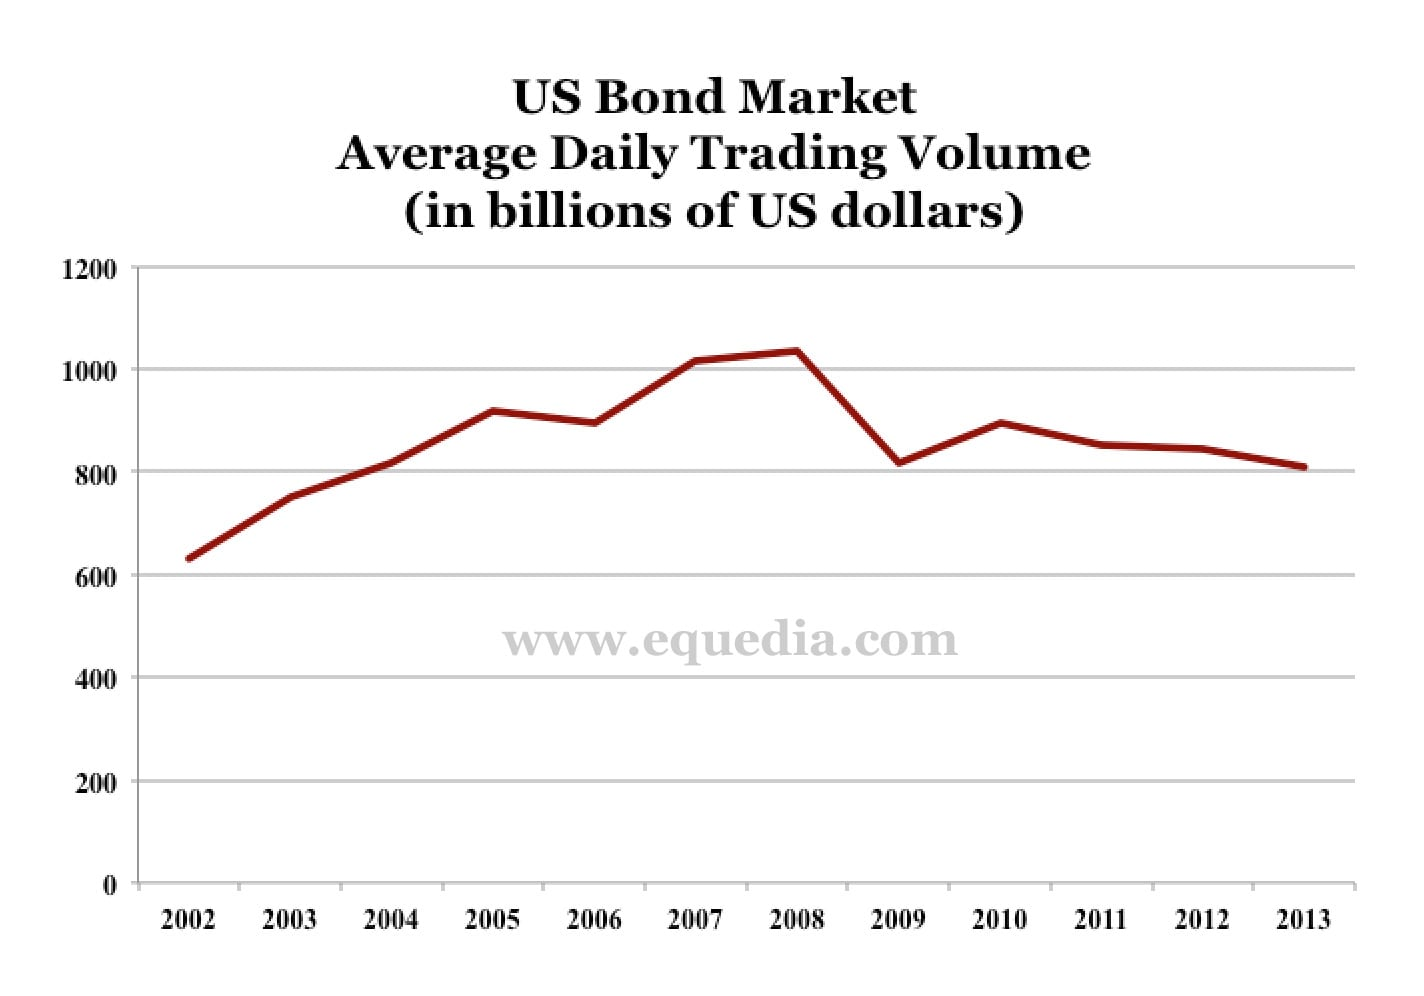 USbondmarketaverage